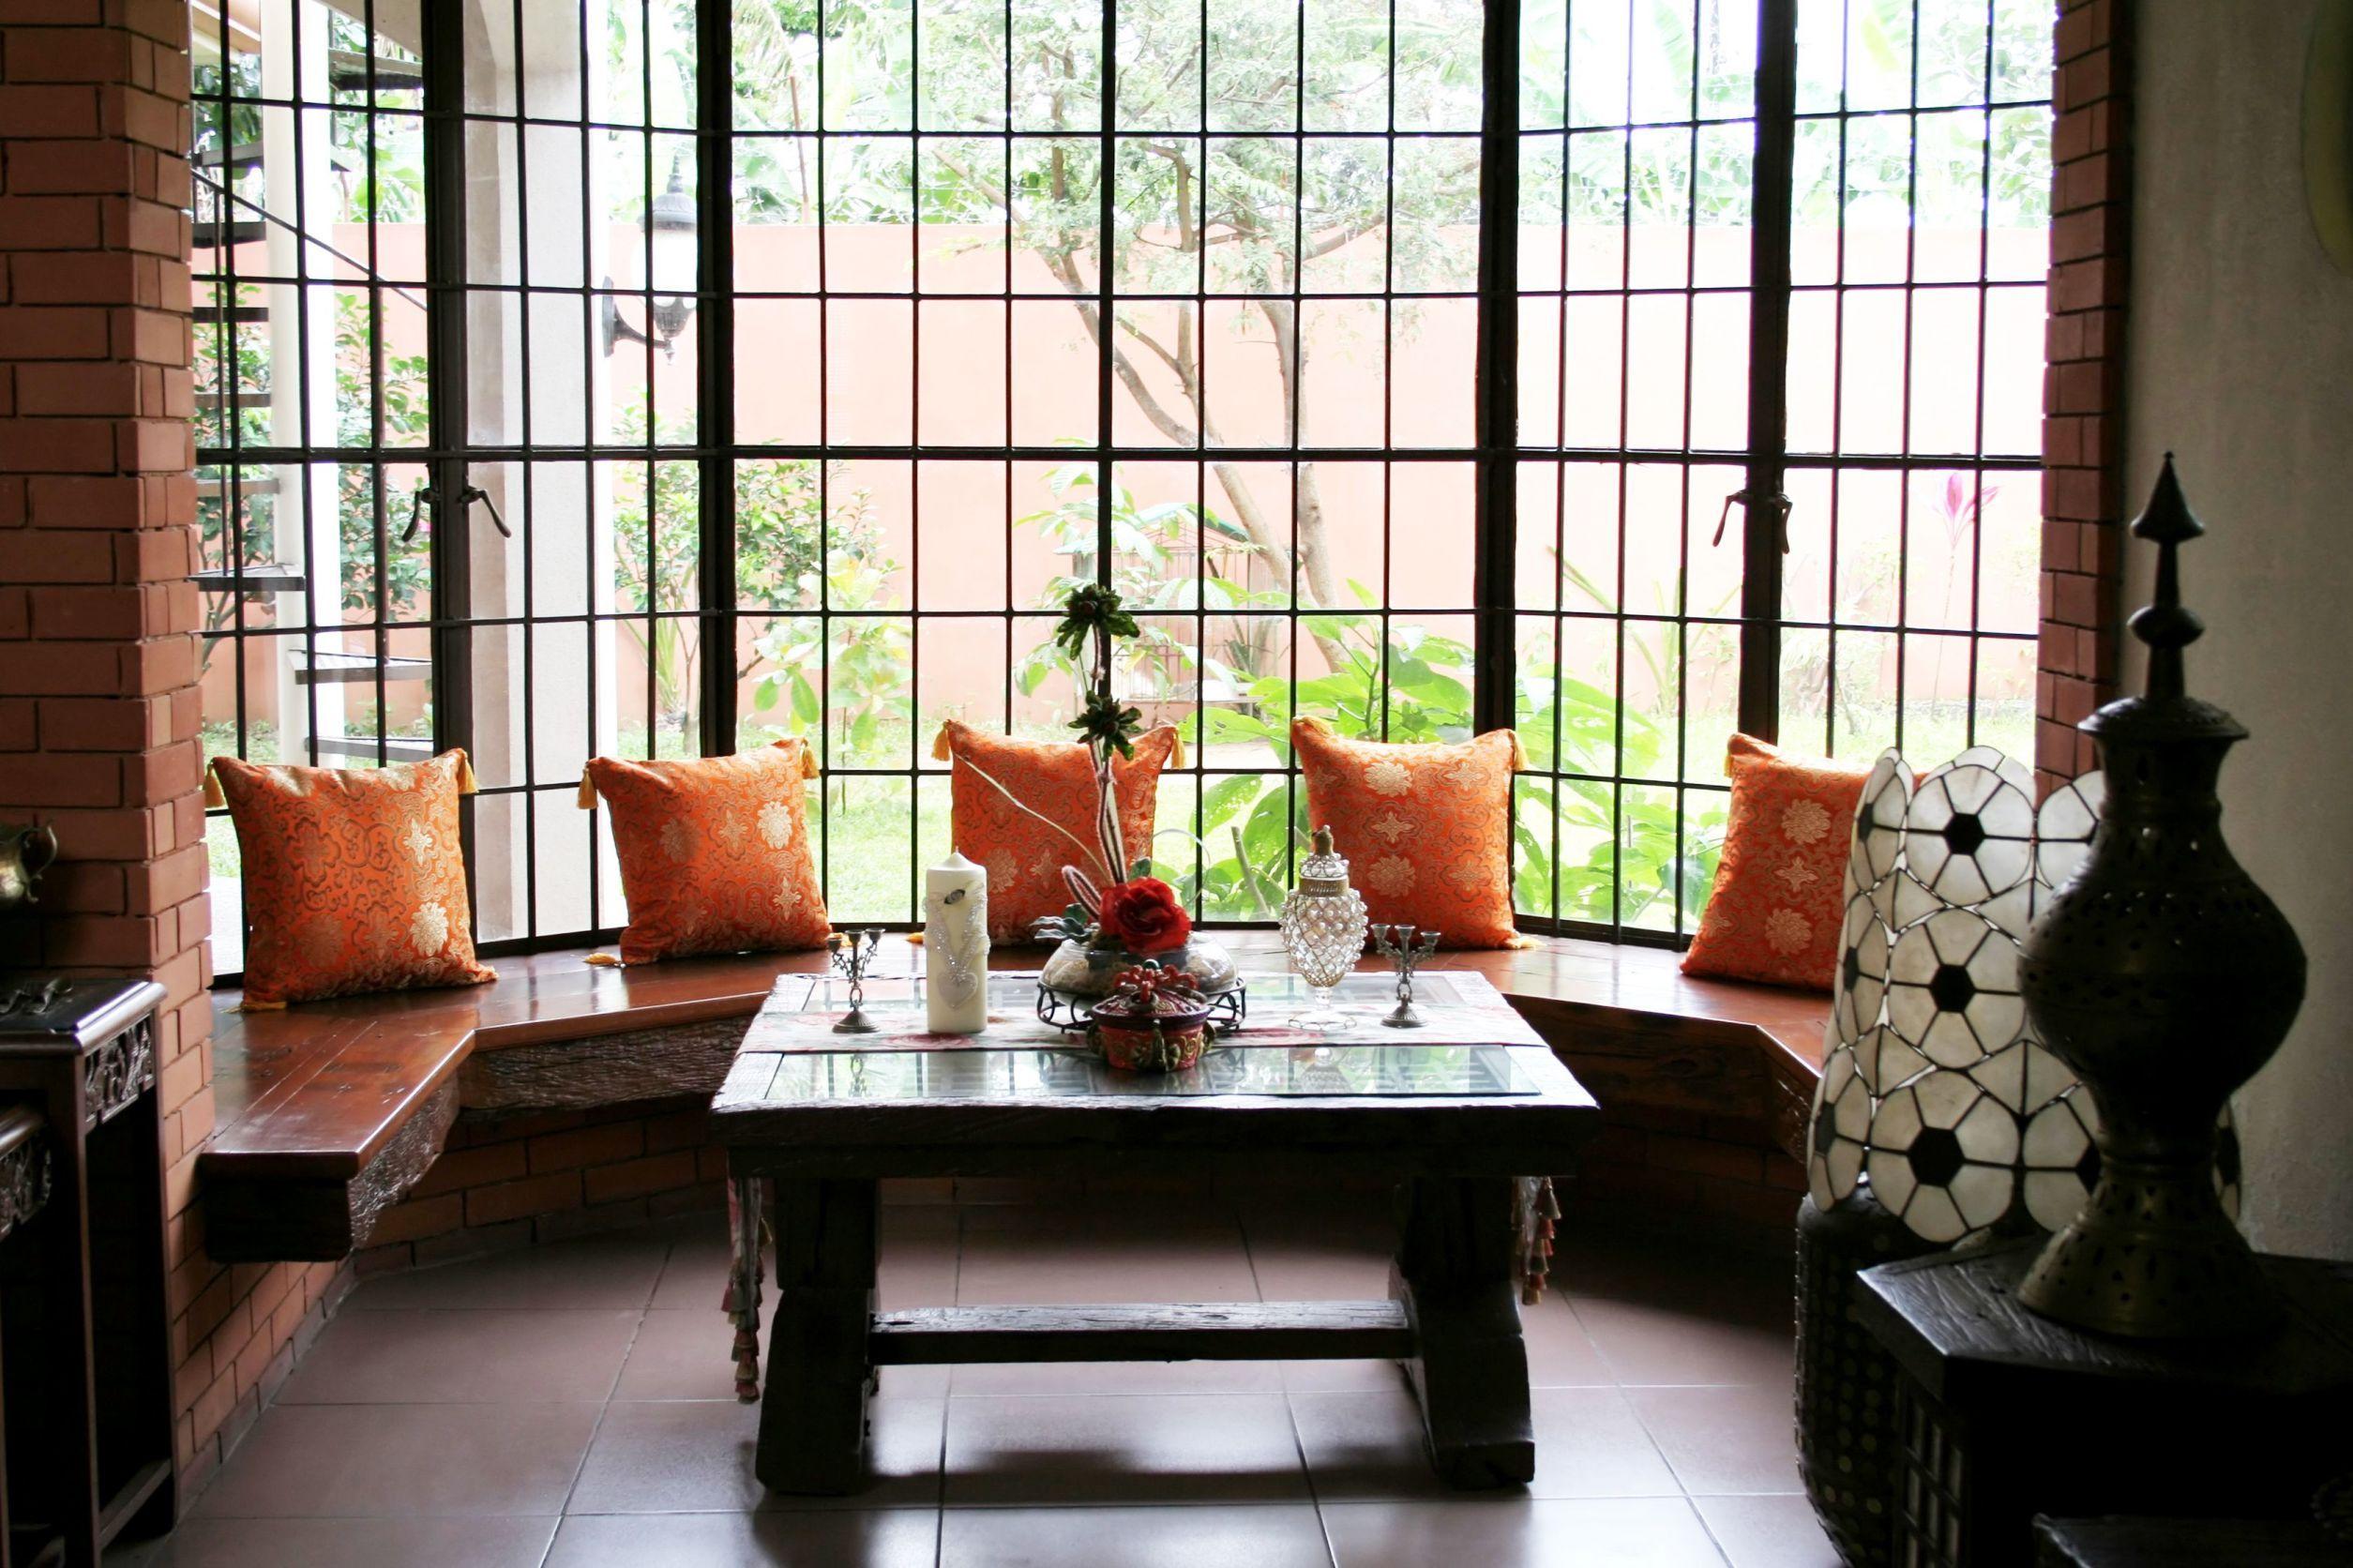 The Basic Principles Of Interior Design House Improvment house